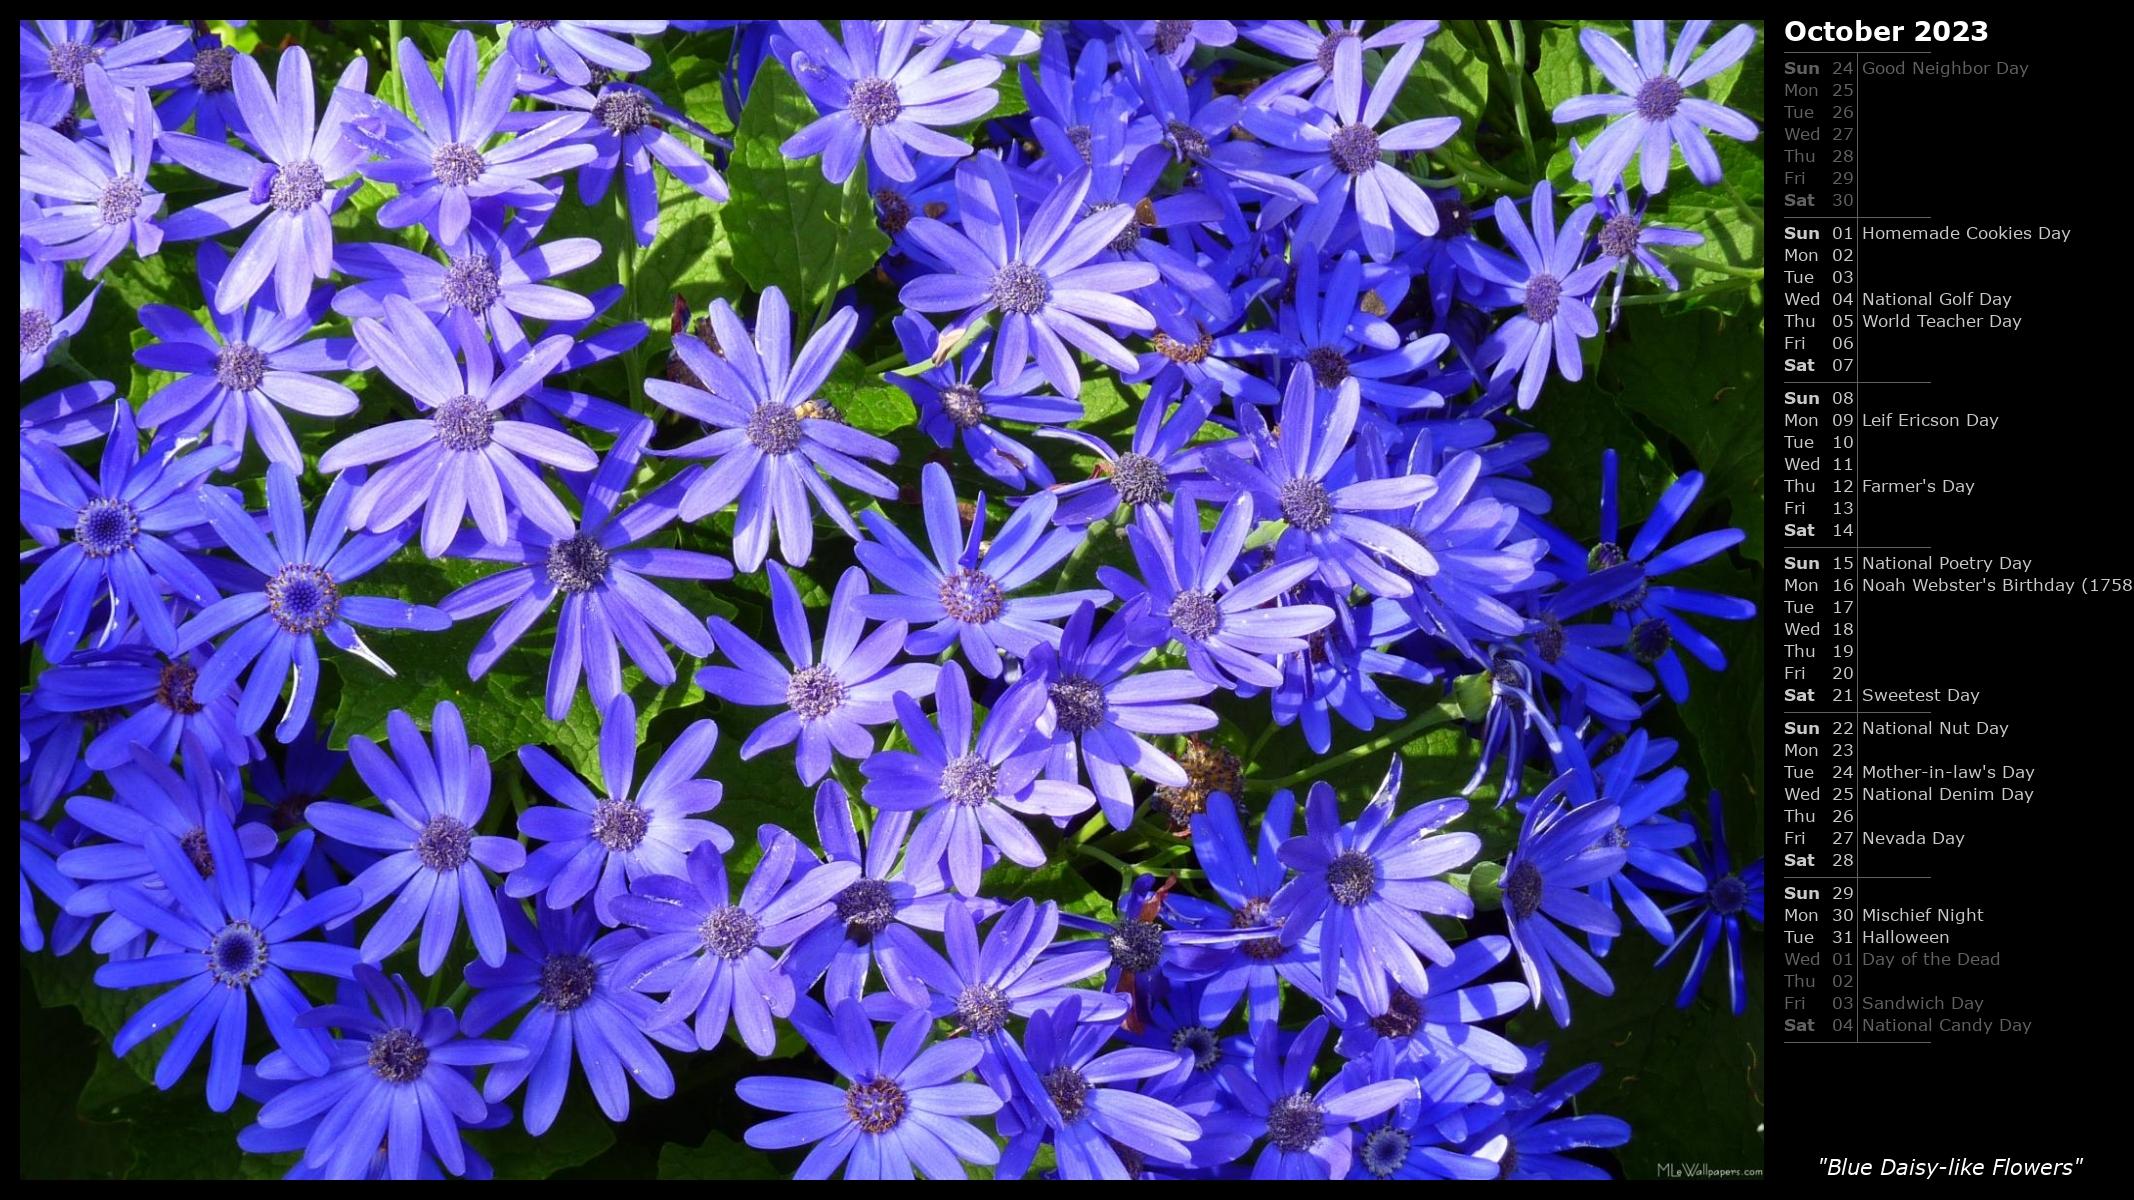 Mlewallpapers Blue Daisy Like Flowers Calendar